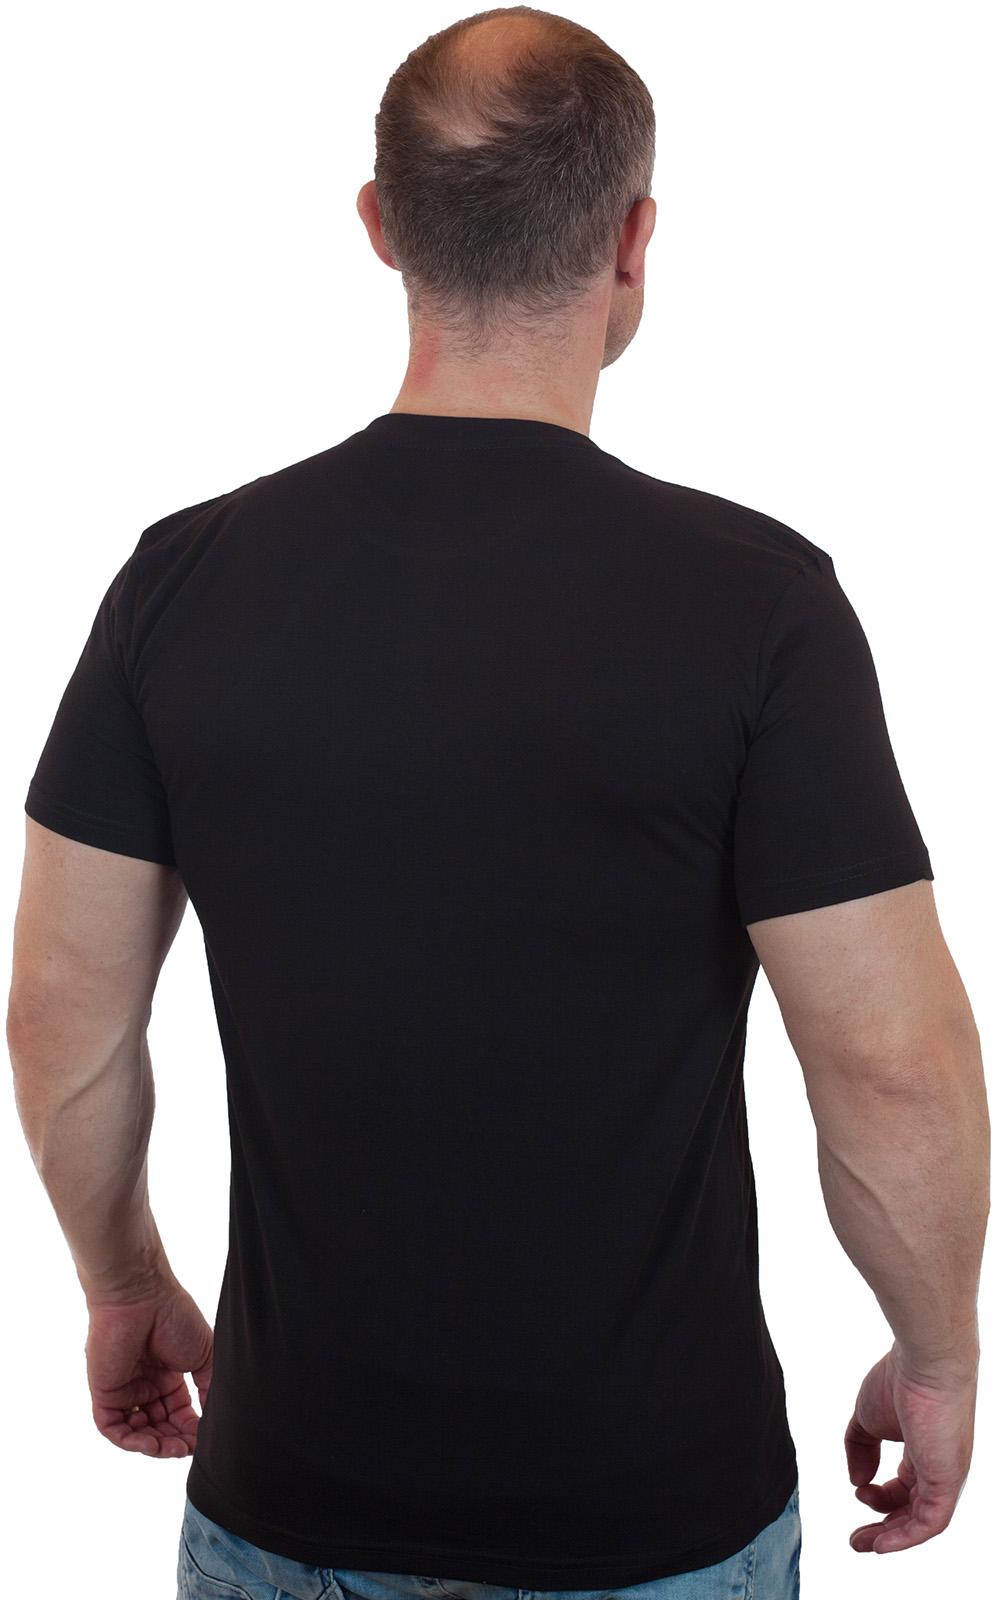 Крутая футболка для всех, кто знает, кто такой Дядя Вася!